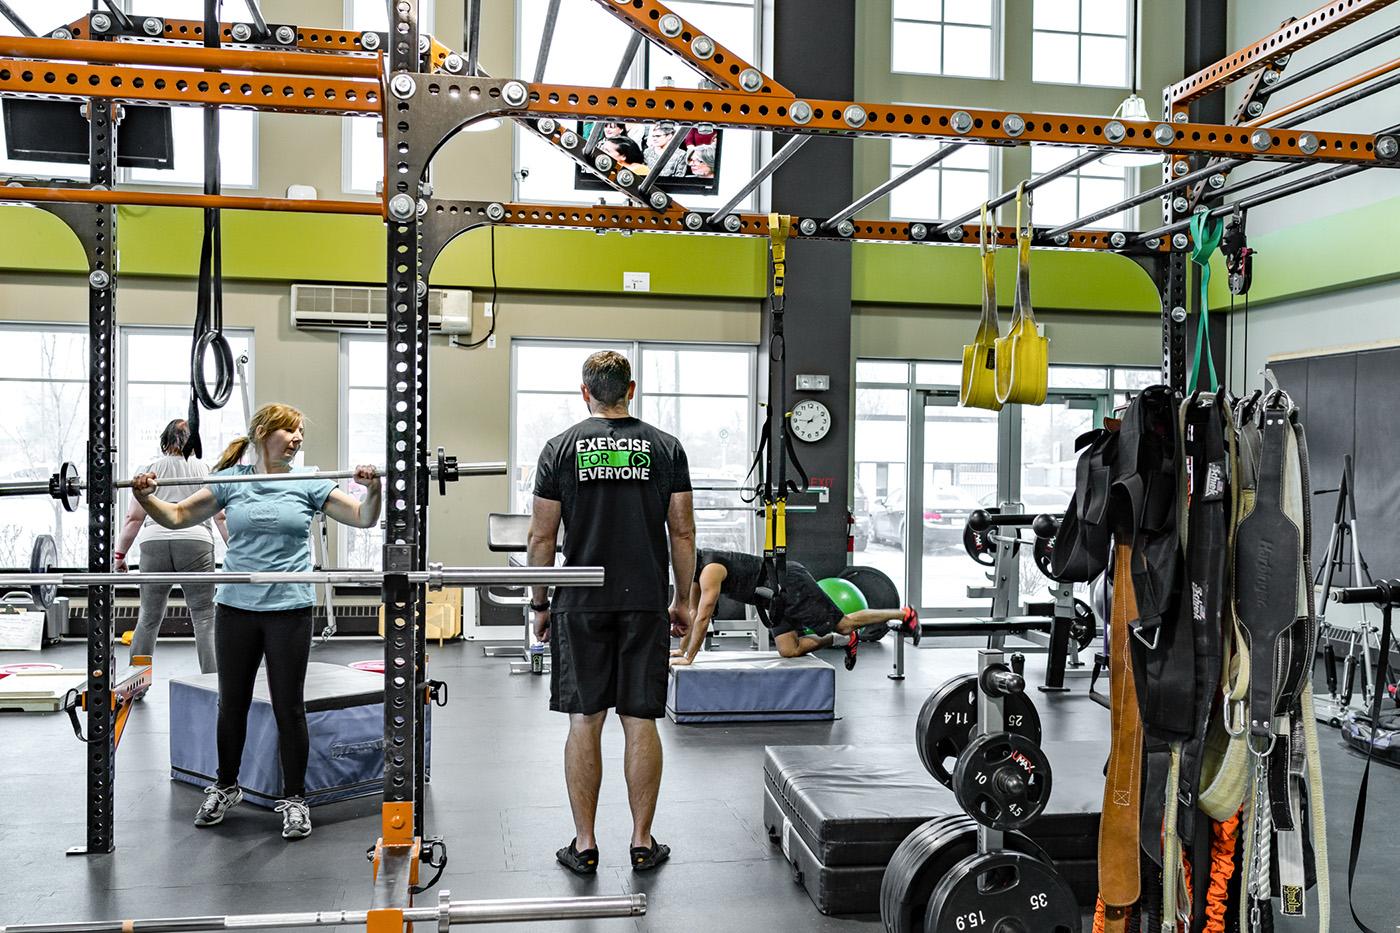 cityfit-gym-personal-training-calgary-workout-facility-inglewood-19.jpg